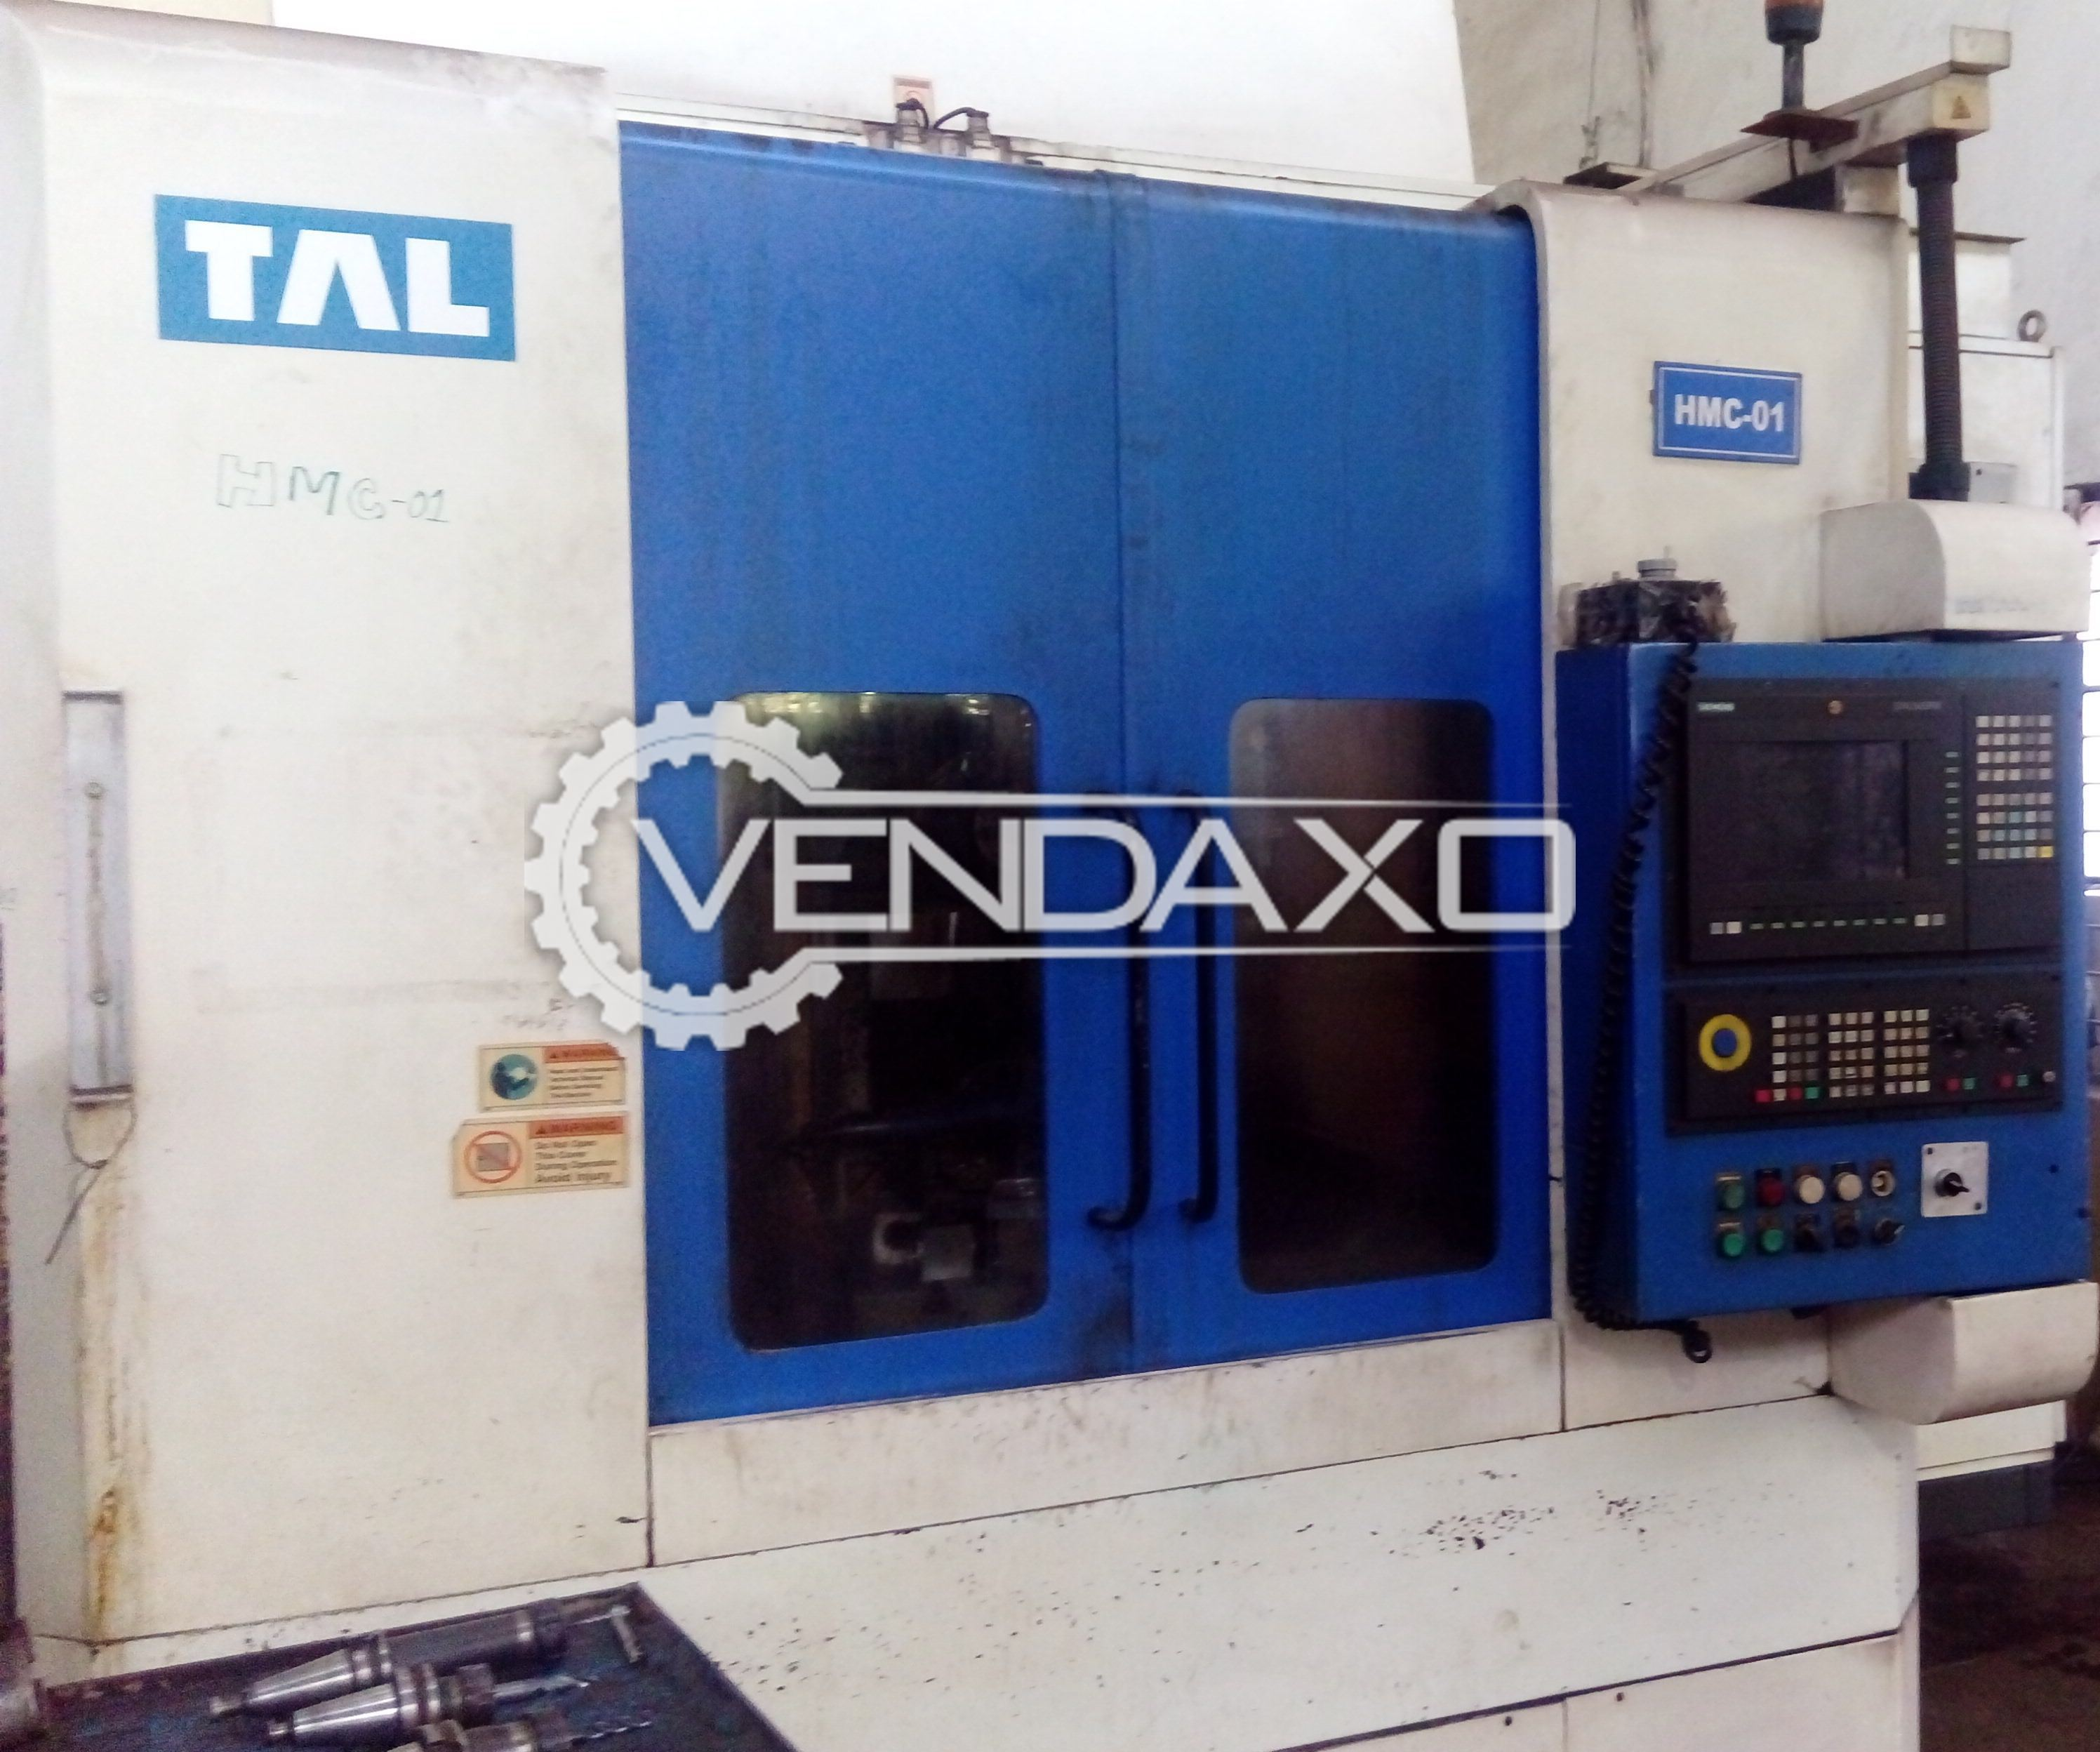 TAL CNC Horizontal Machining Center HMC - 1000 x 500 x 500 mm